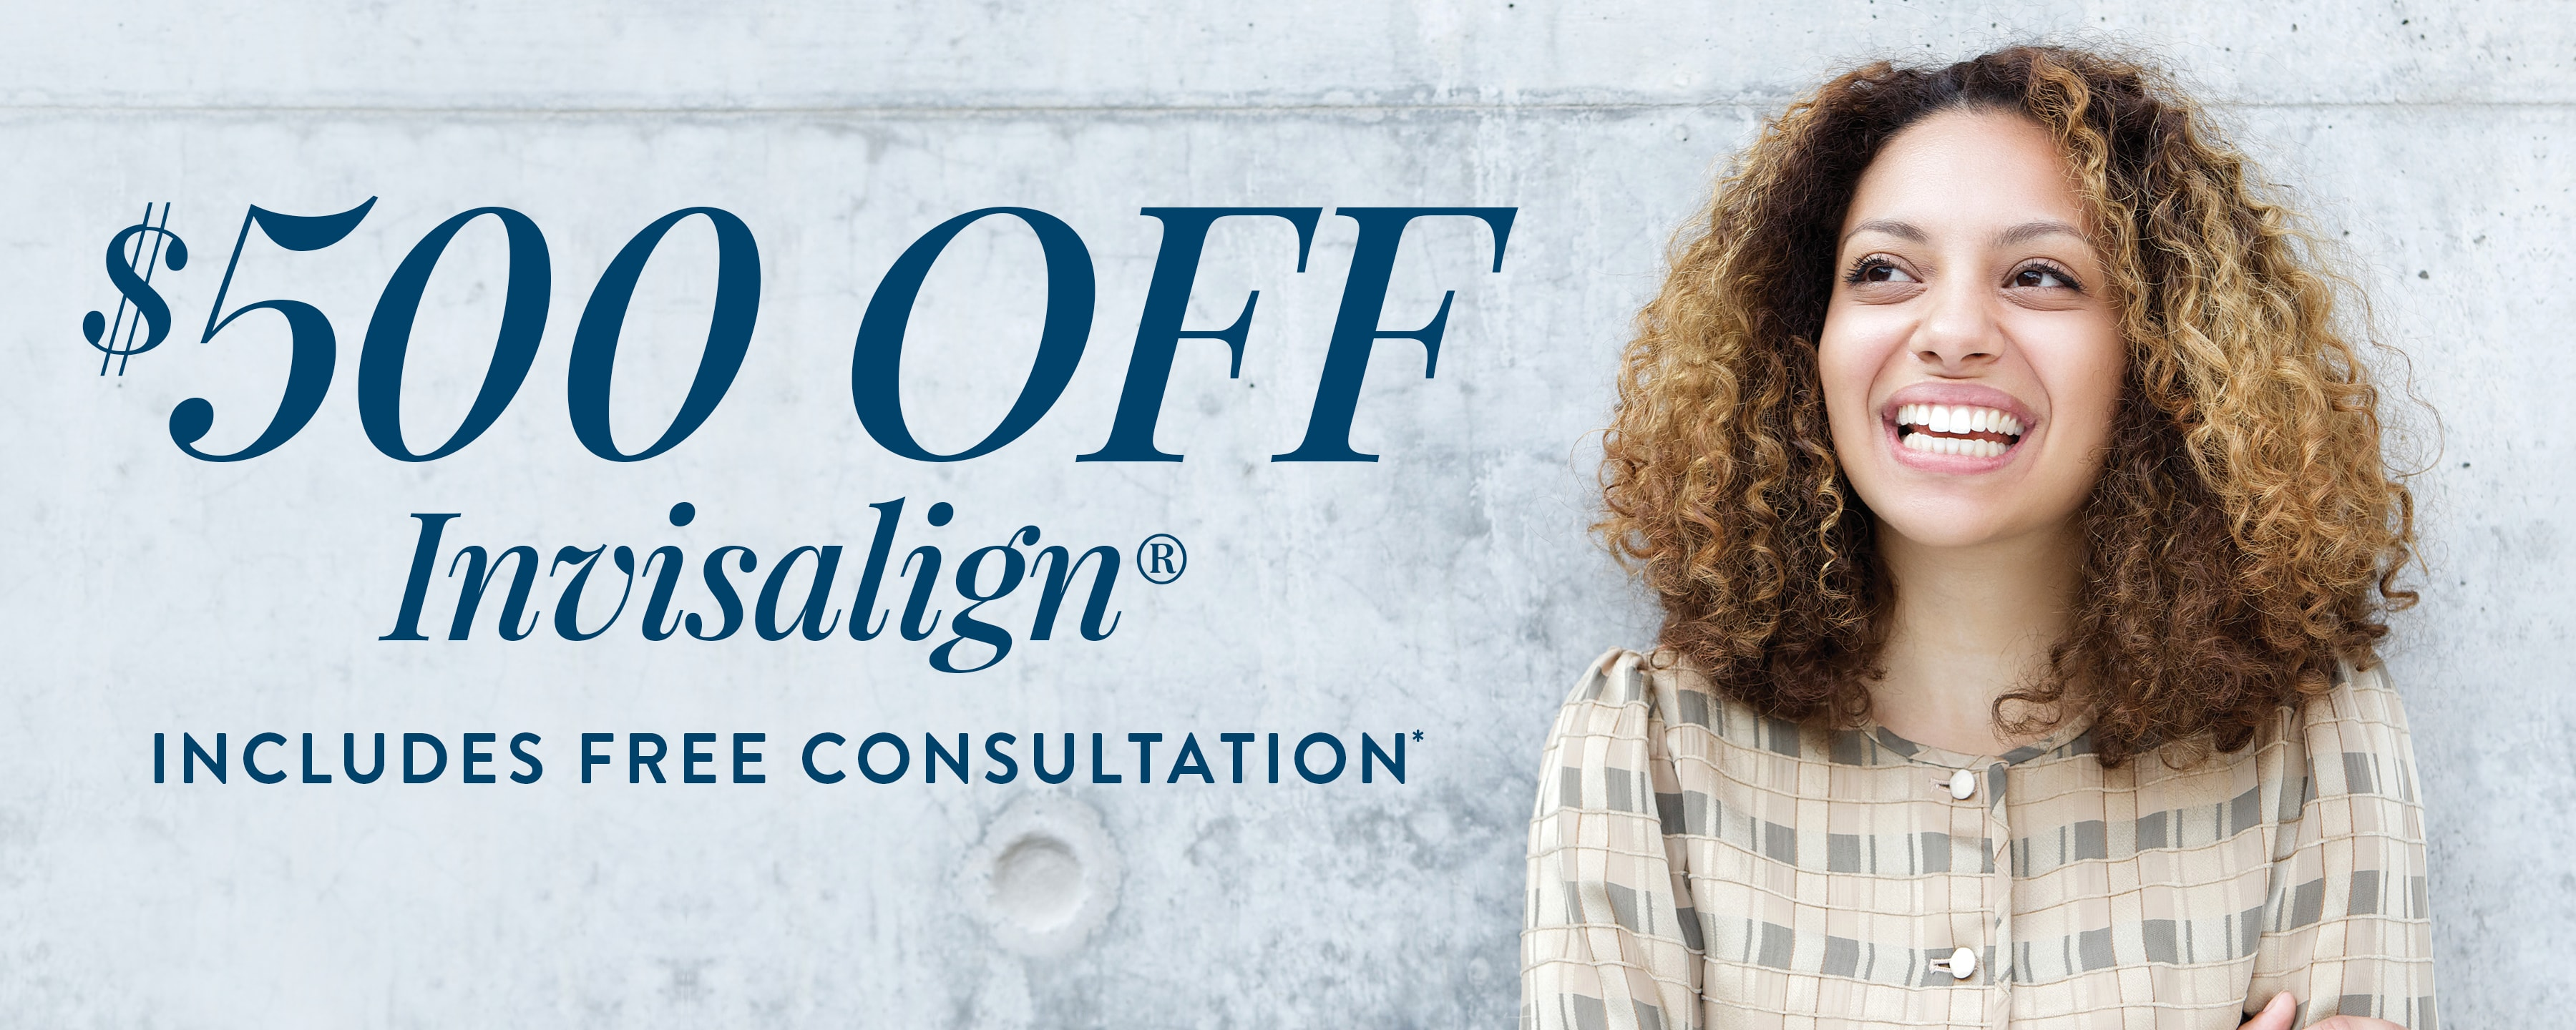 $500 OFF Invisalign including consultation